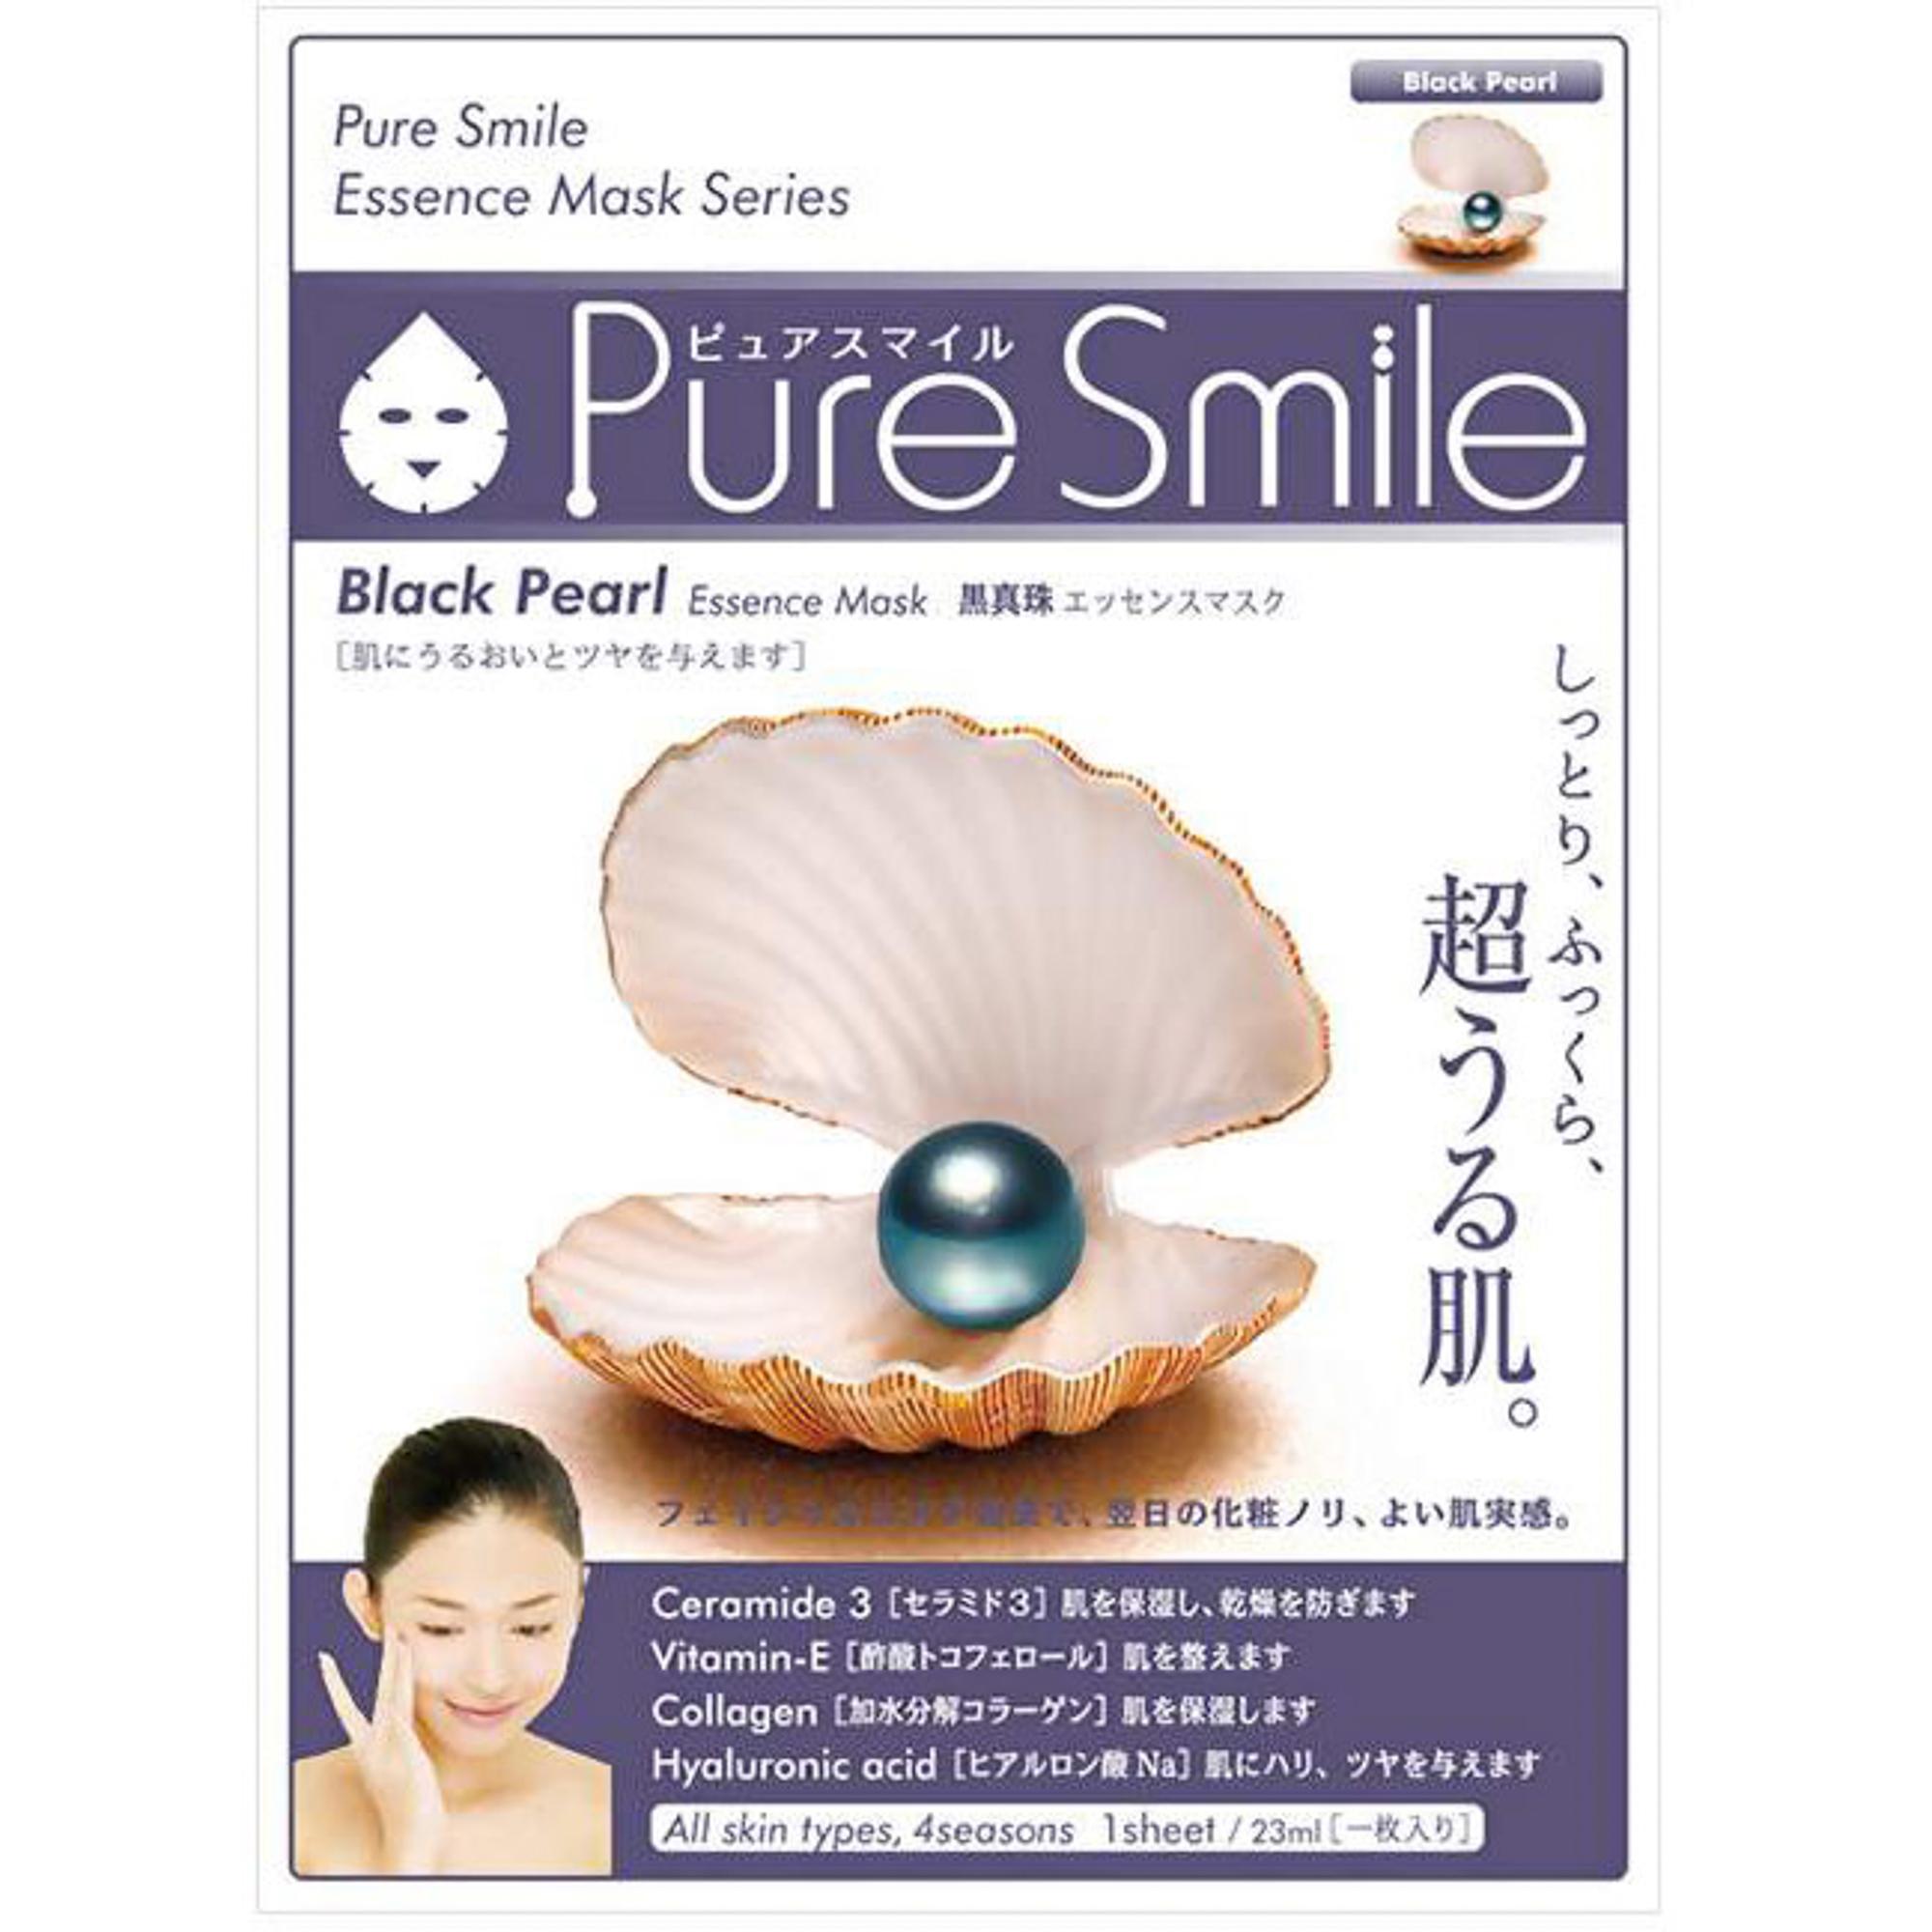 Фото - Маска для лица SunSmile Pure Smile Essence Mask Black Pearl 23 мл маска для лица sunsmile pure smile essence mask green tea 23 мл